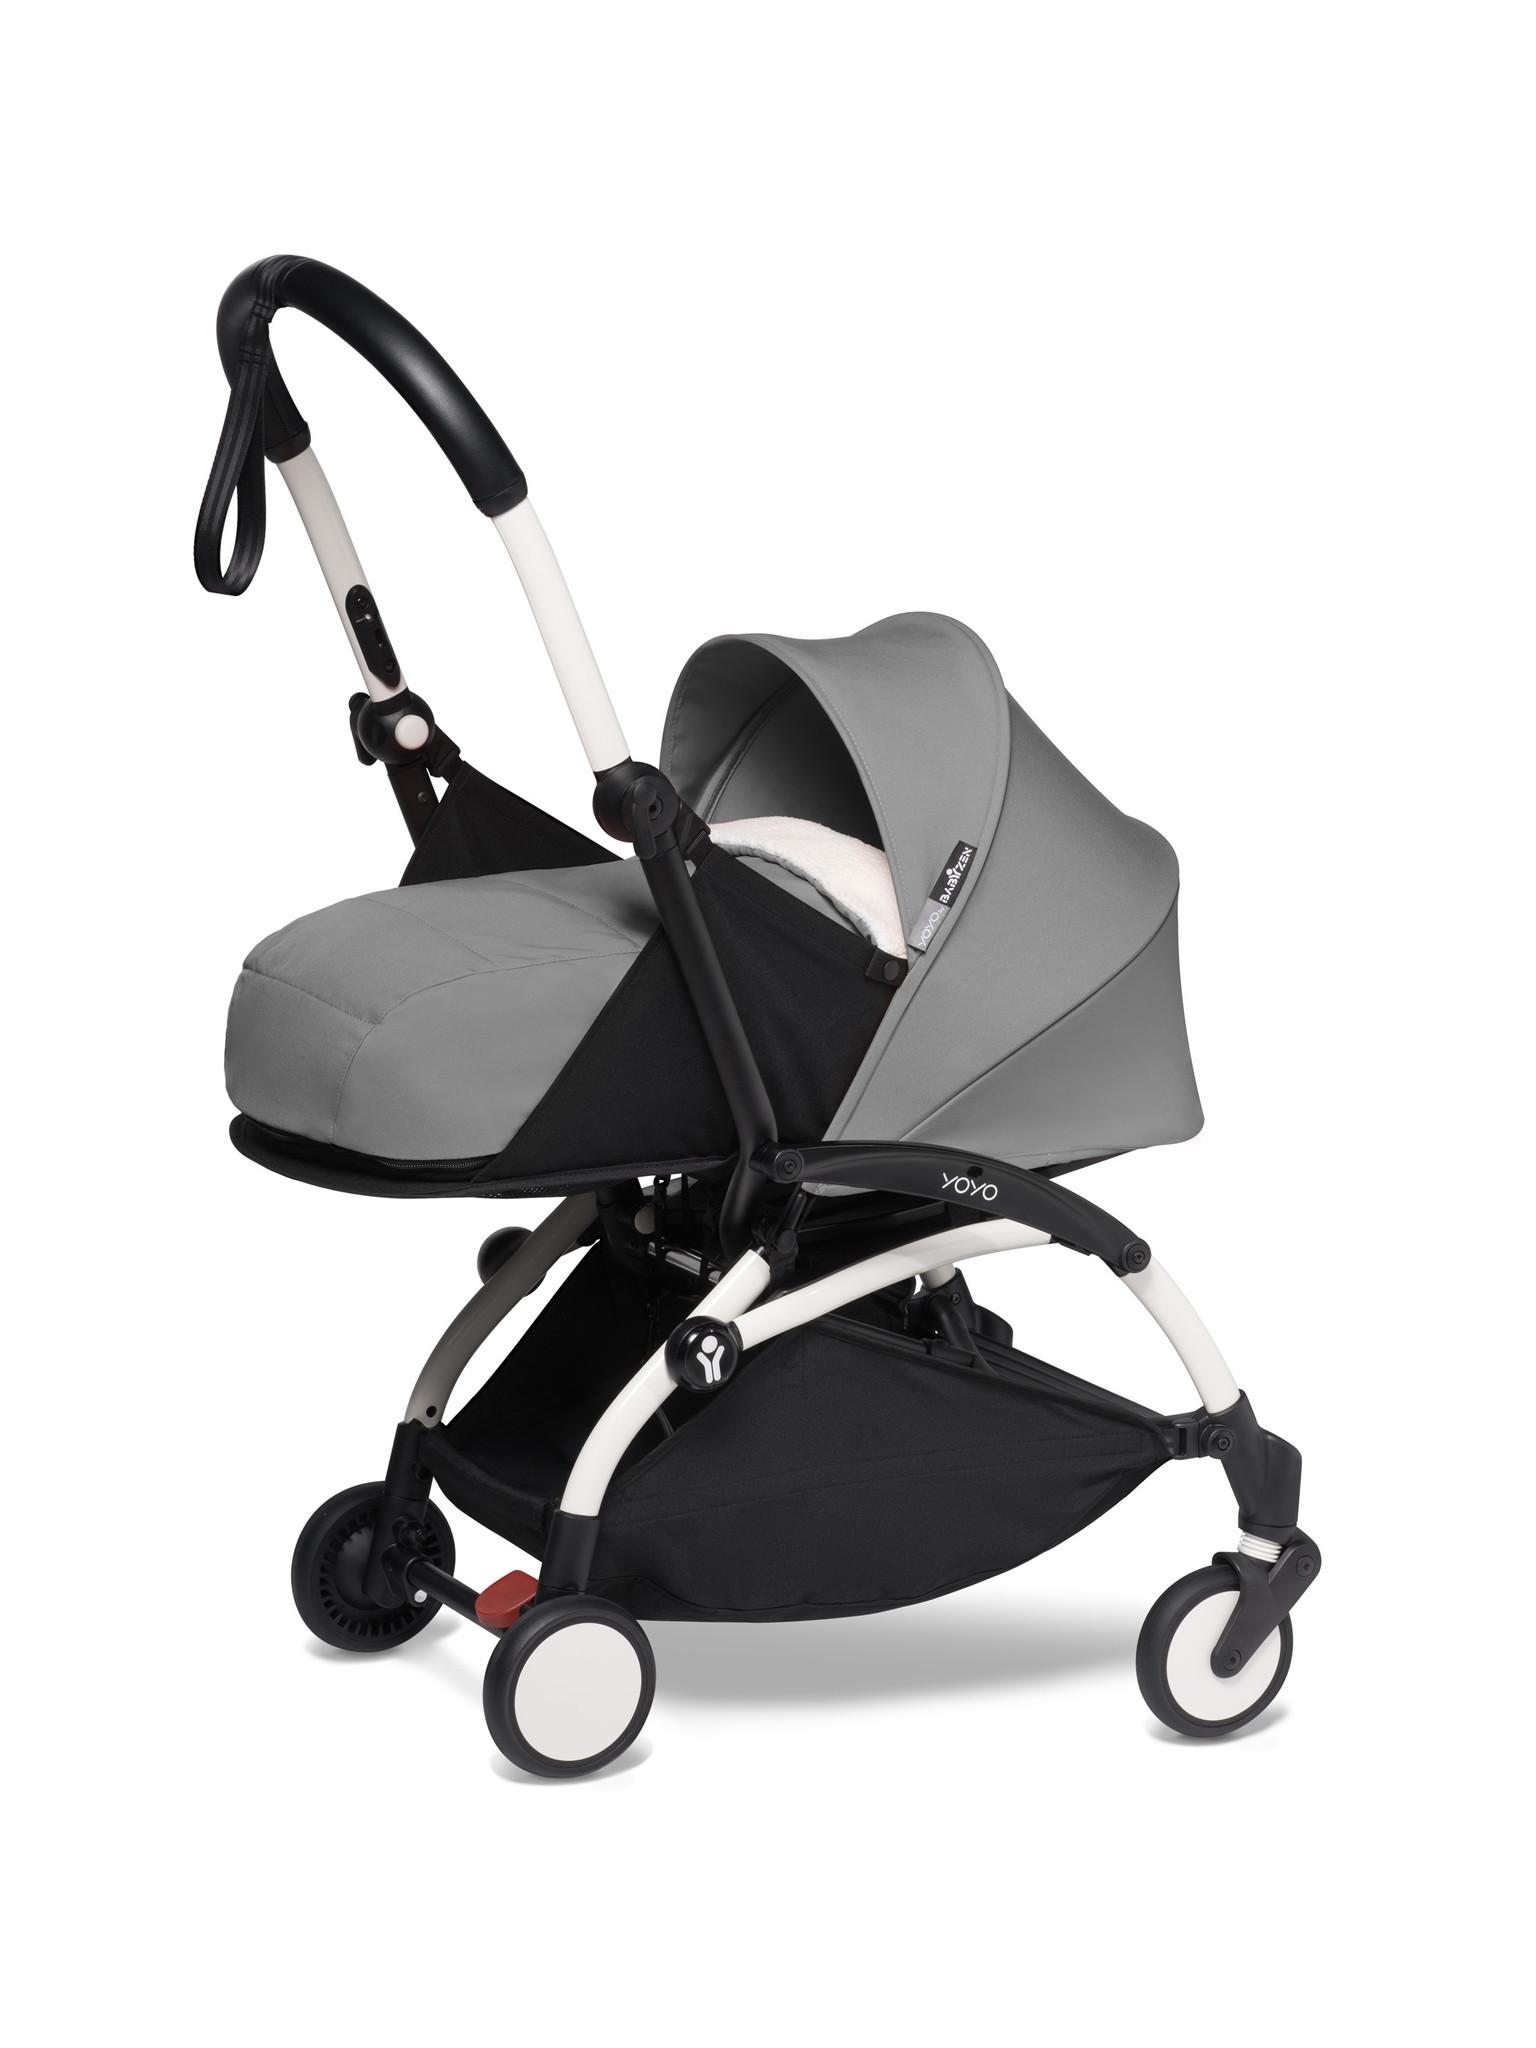 Babyzen Babyzen YOYO² buggy COMPLEET / FULL SET 0+ and 6+ grijs frame wit incl. YOYO² BeSafe autostoel zwart